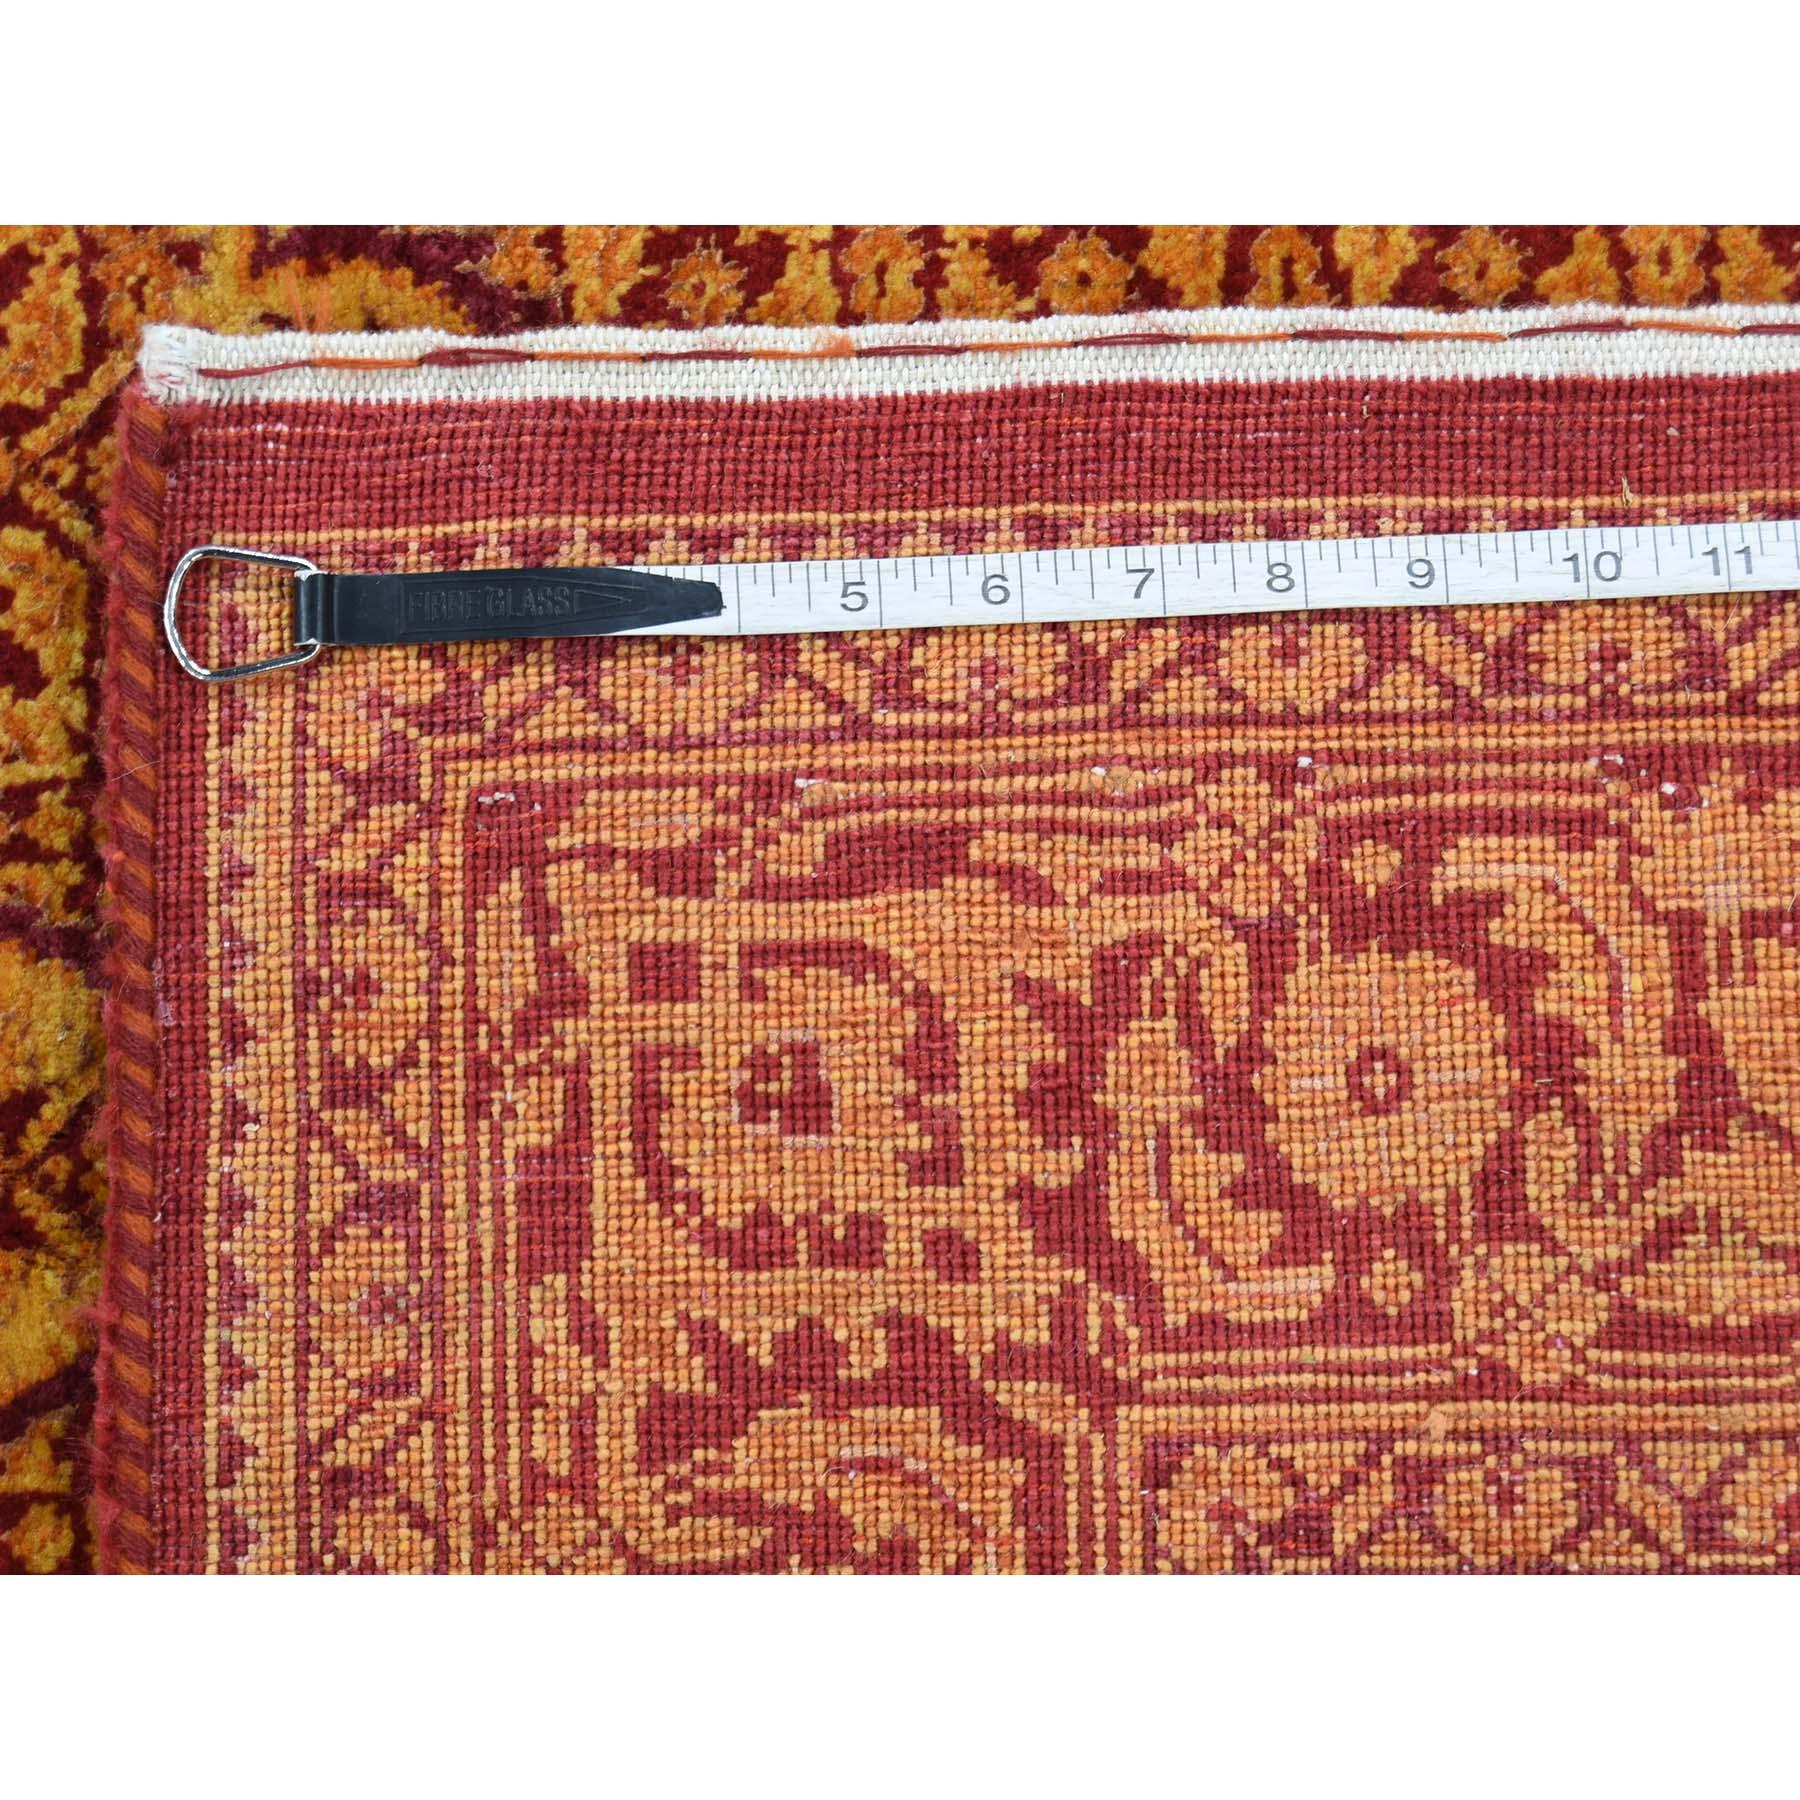 5-x6-9  Tone on Tone Tabriz Mahi Wool and Silk Hand Knotted Oriental Rug